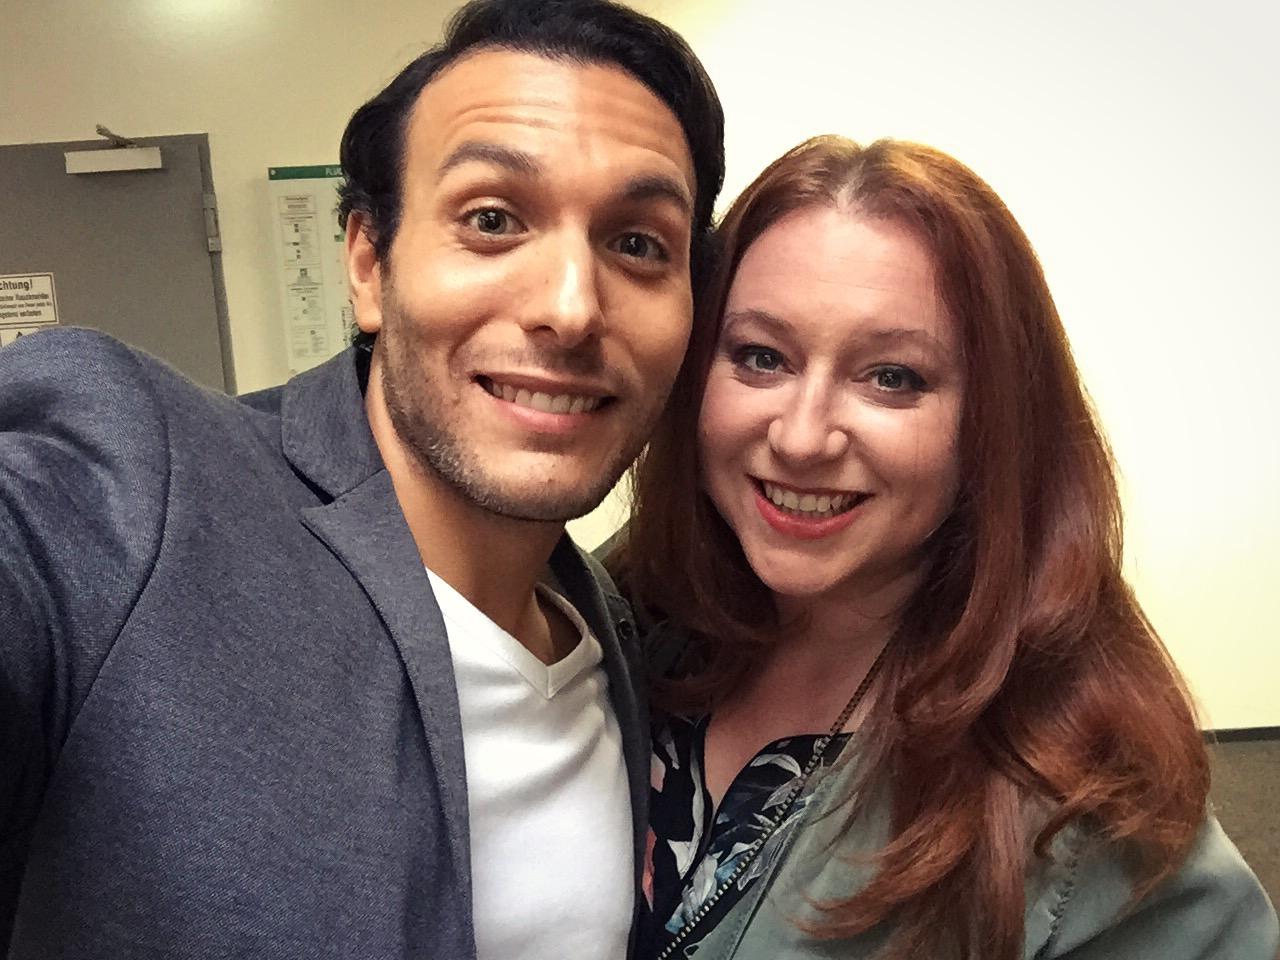 Angus on set with Rebecca Siemoneit-Barum (Iffy).